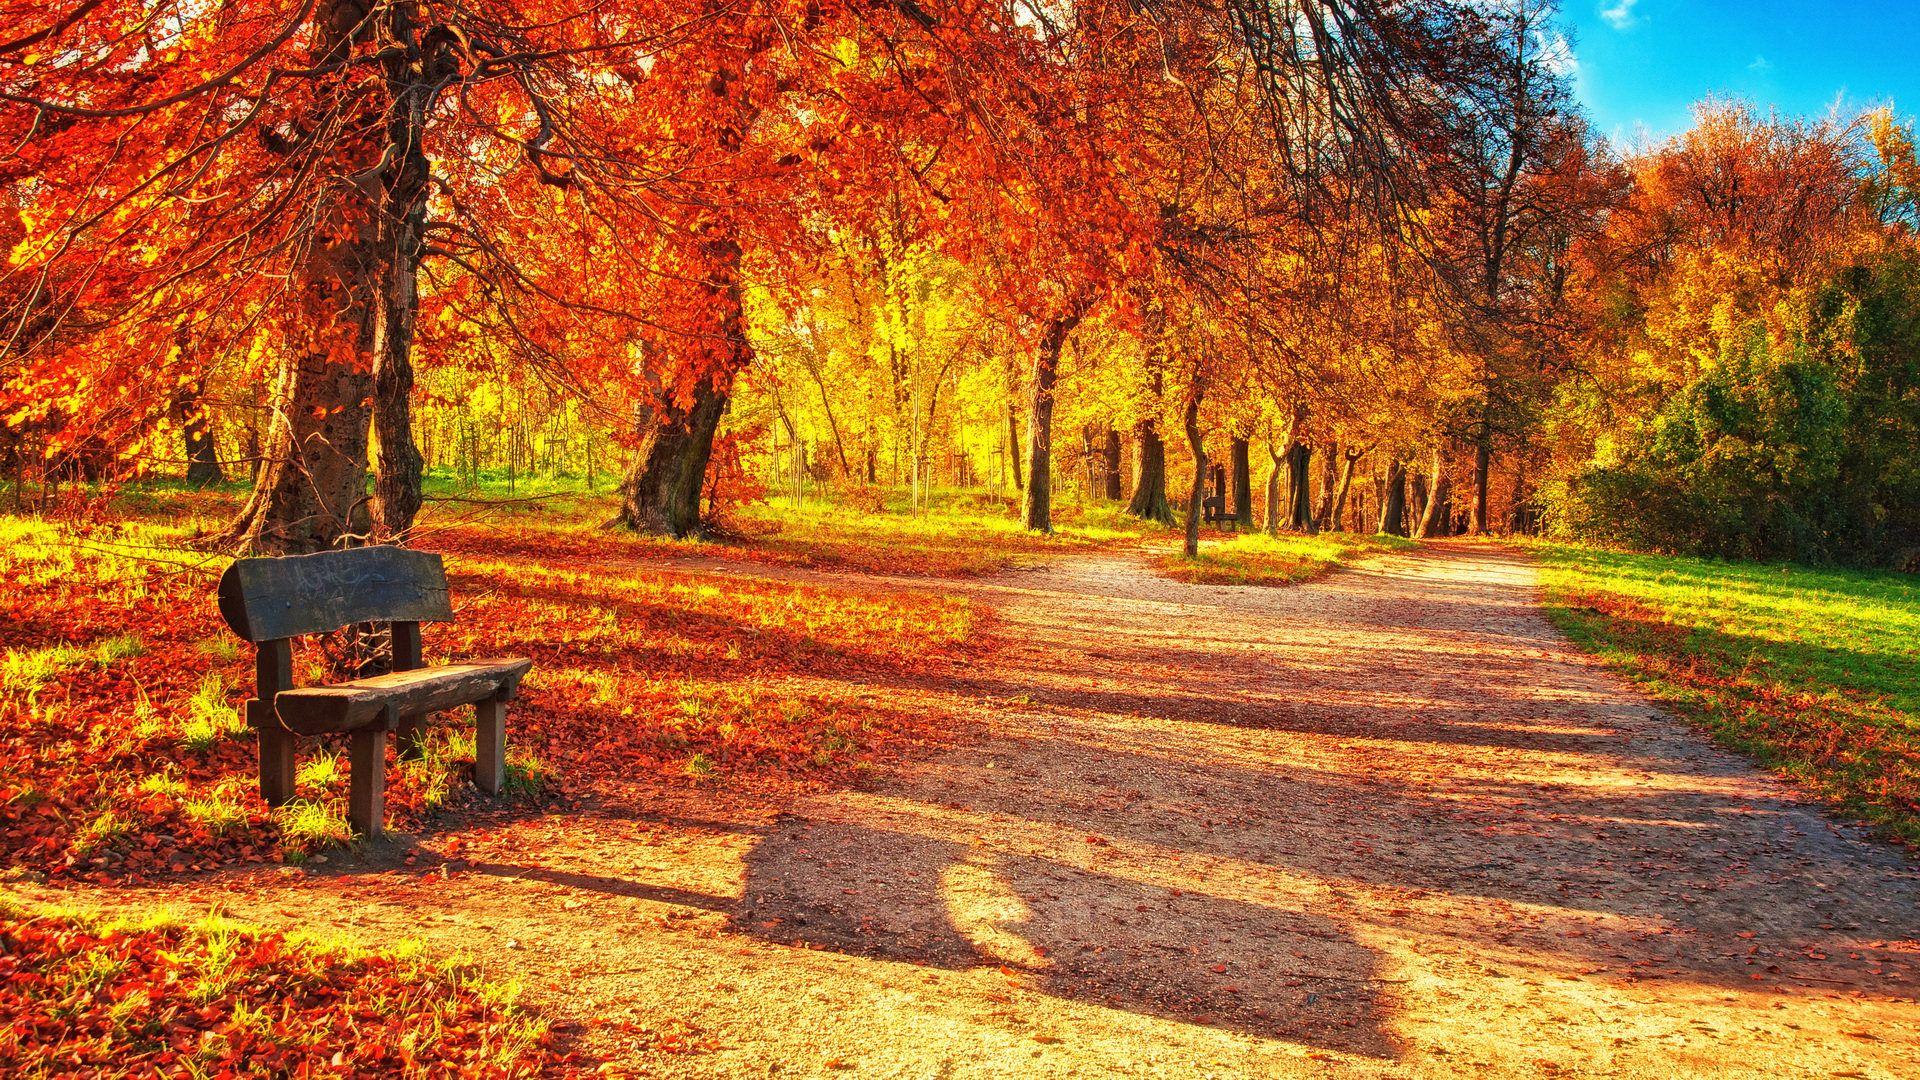 Autumn Leaves Desktop Background Wallpaper High Resolution